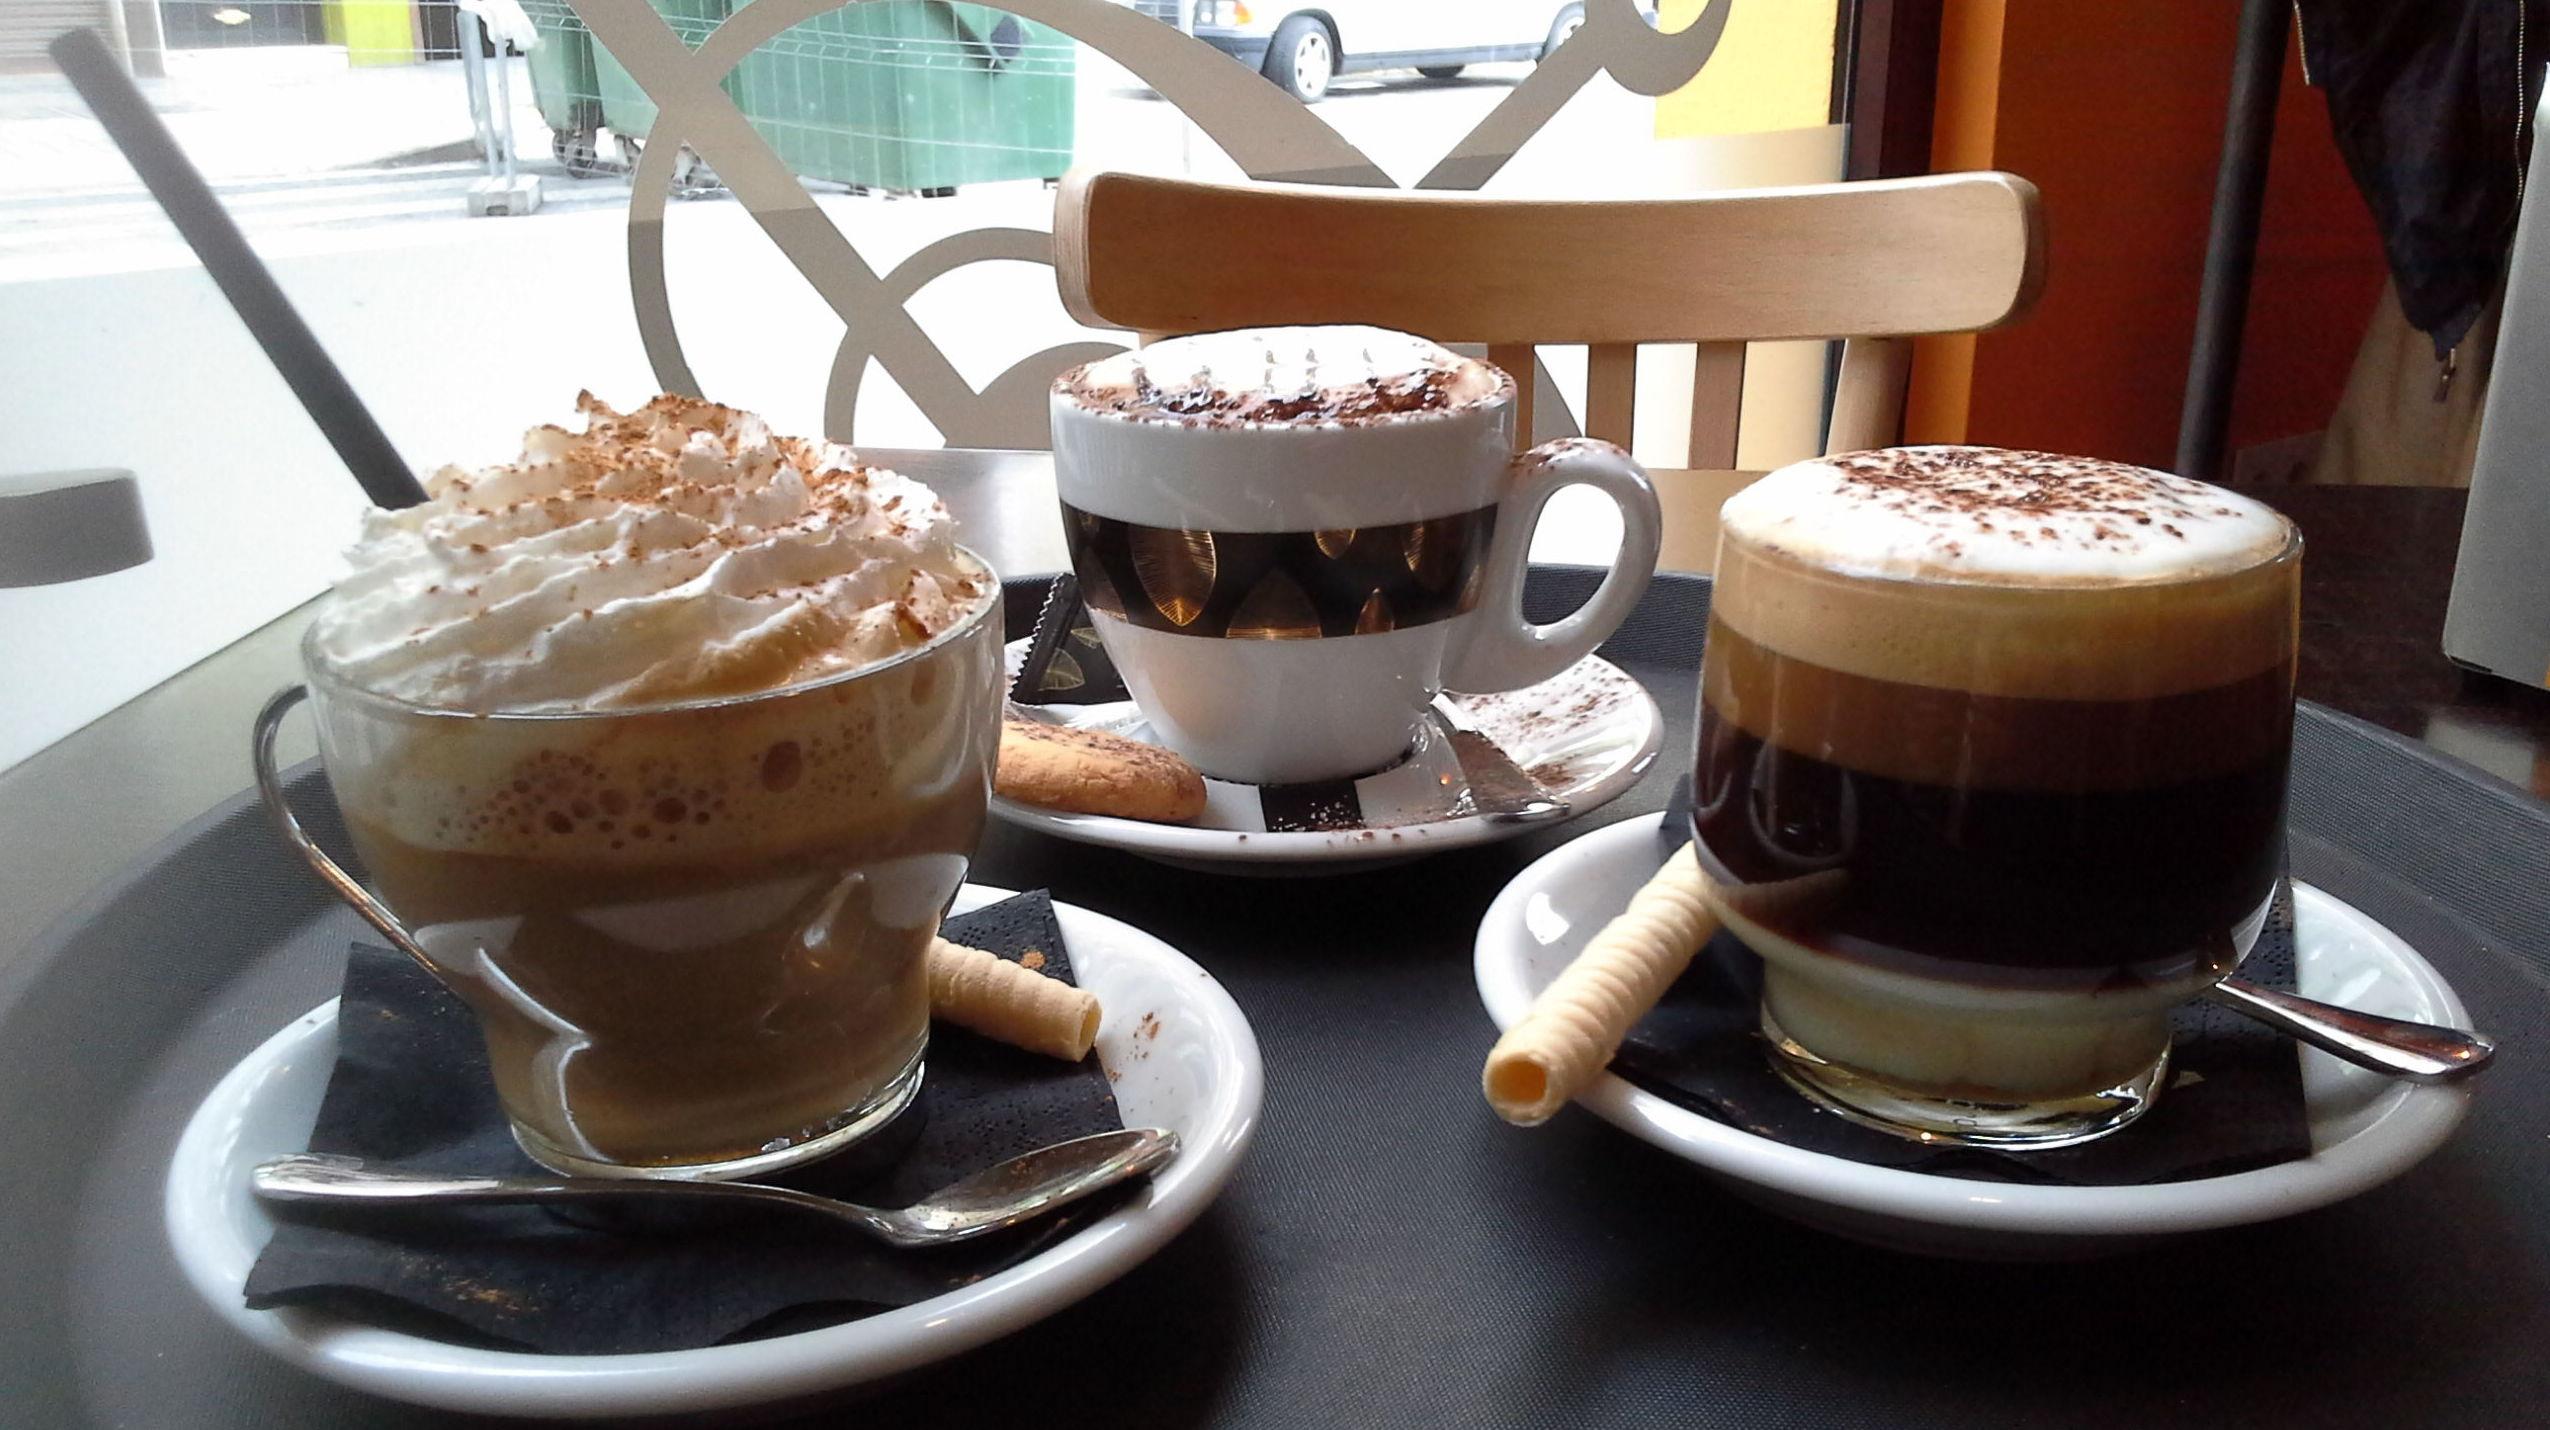 Foto 41 de Restaurante en Valencia | Cafetería Tosteria O´Clock